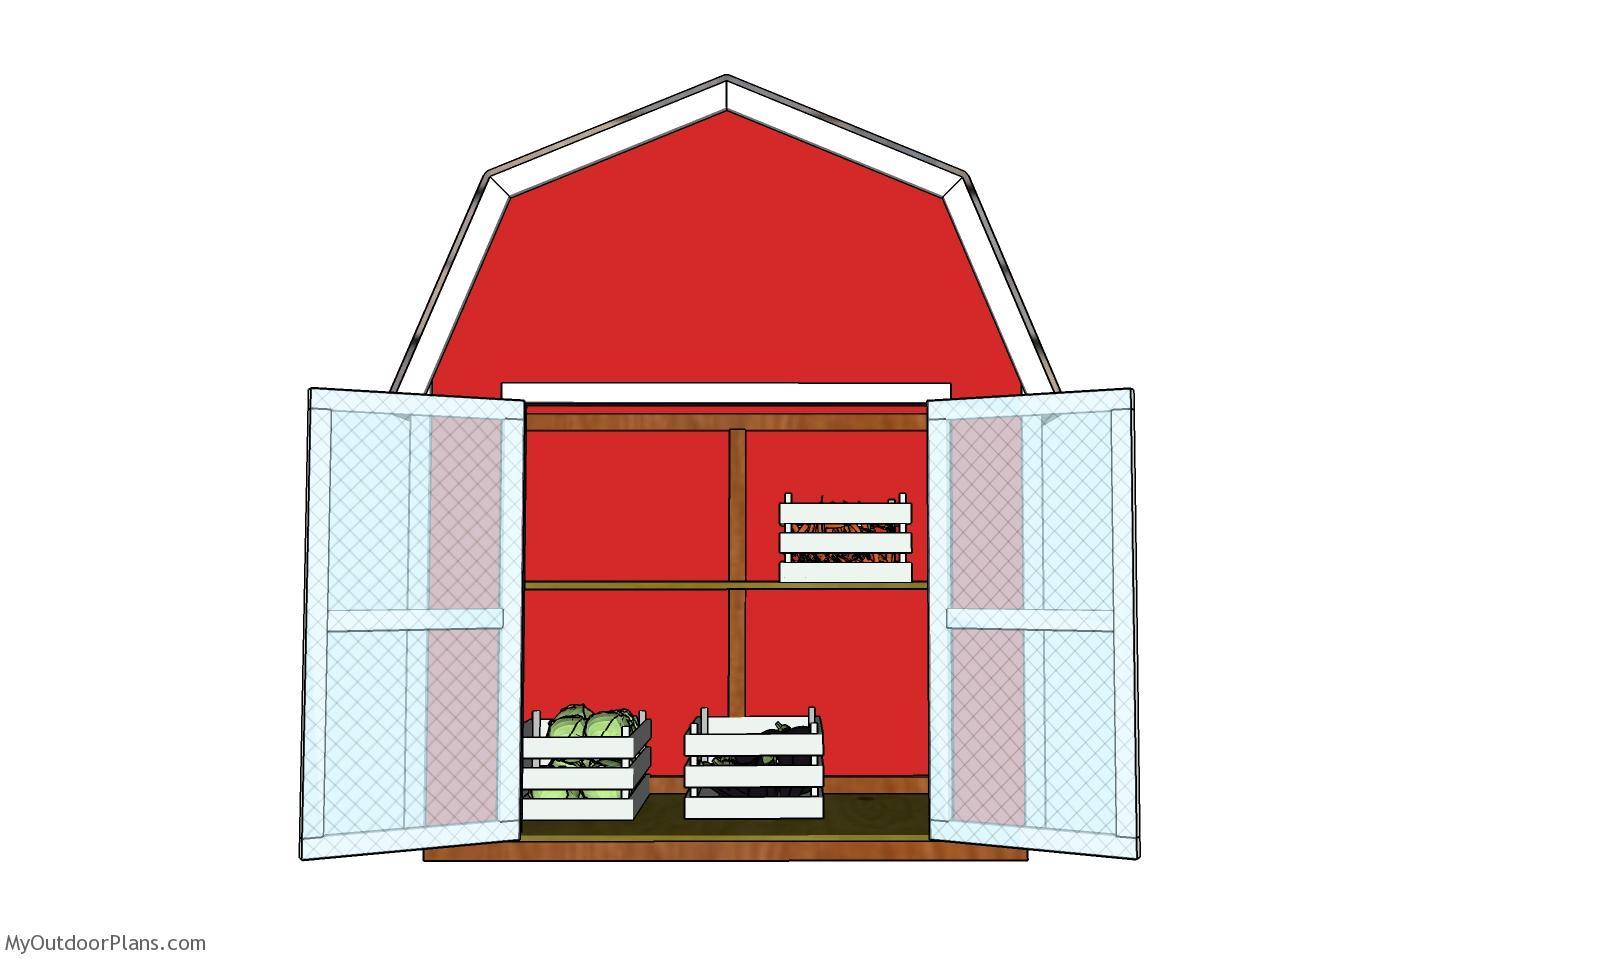 2x4 Barn Shaped Vegetable Display - Free DIY Plans